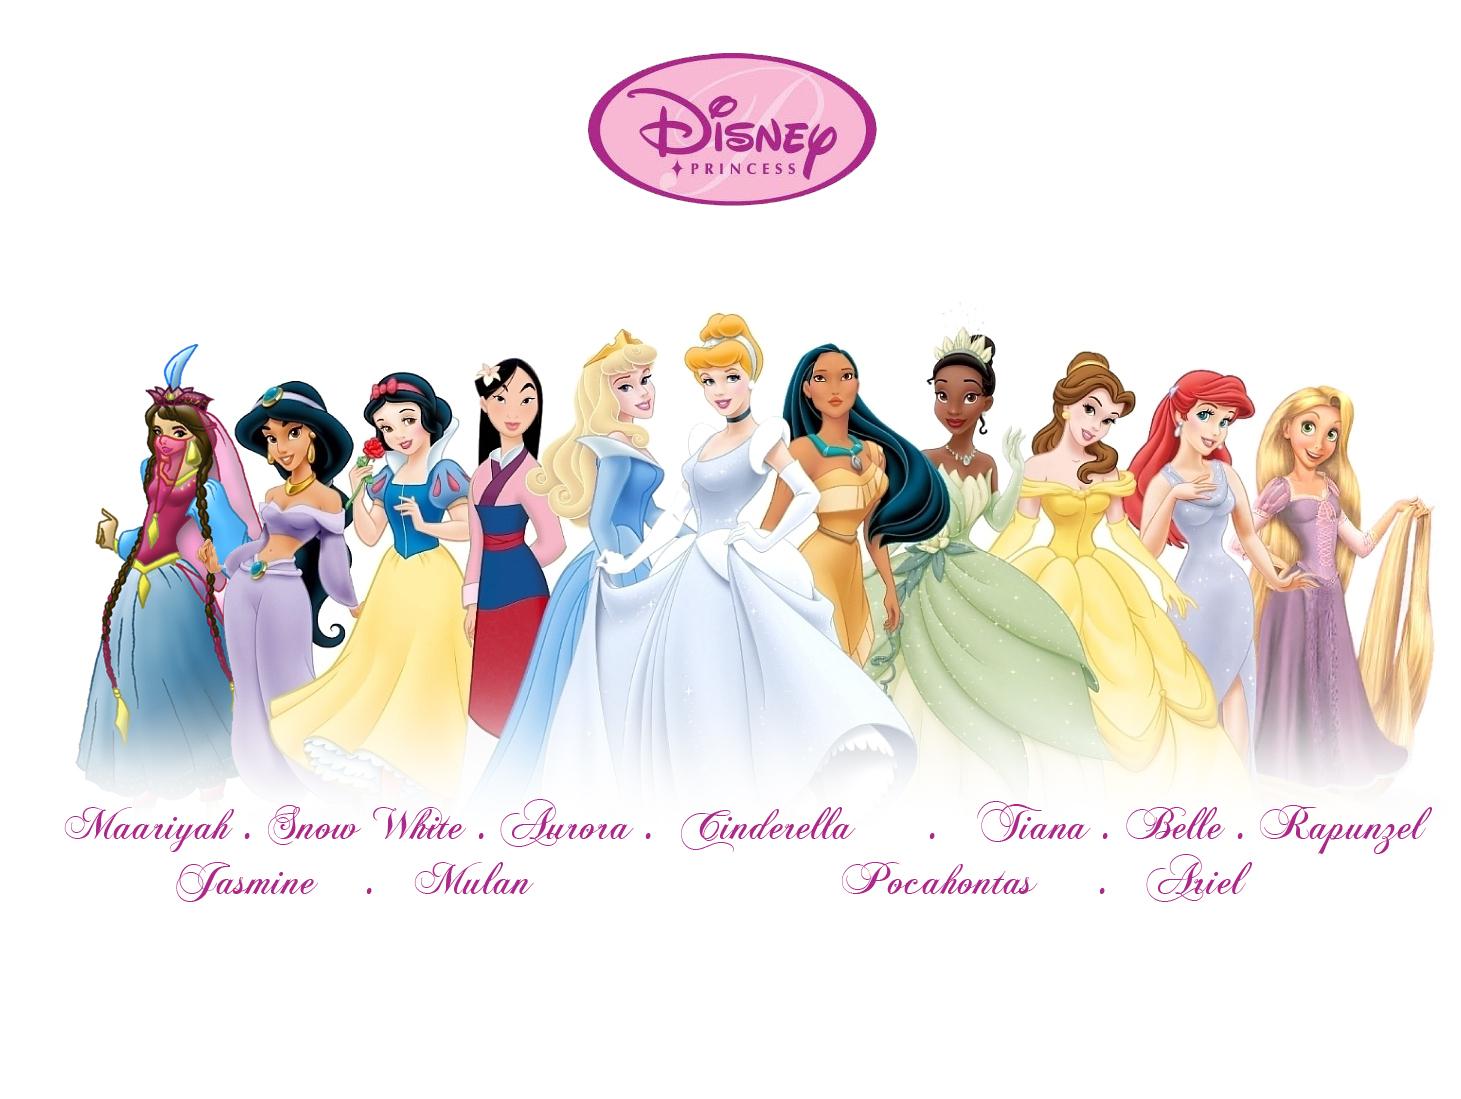 Disney Princess Figurines Picture Disney Princess Figurines Image